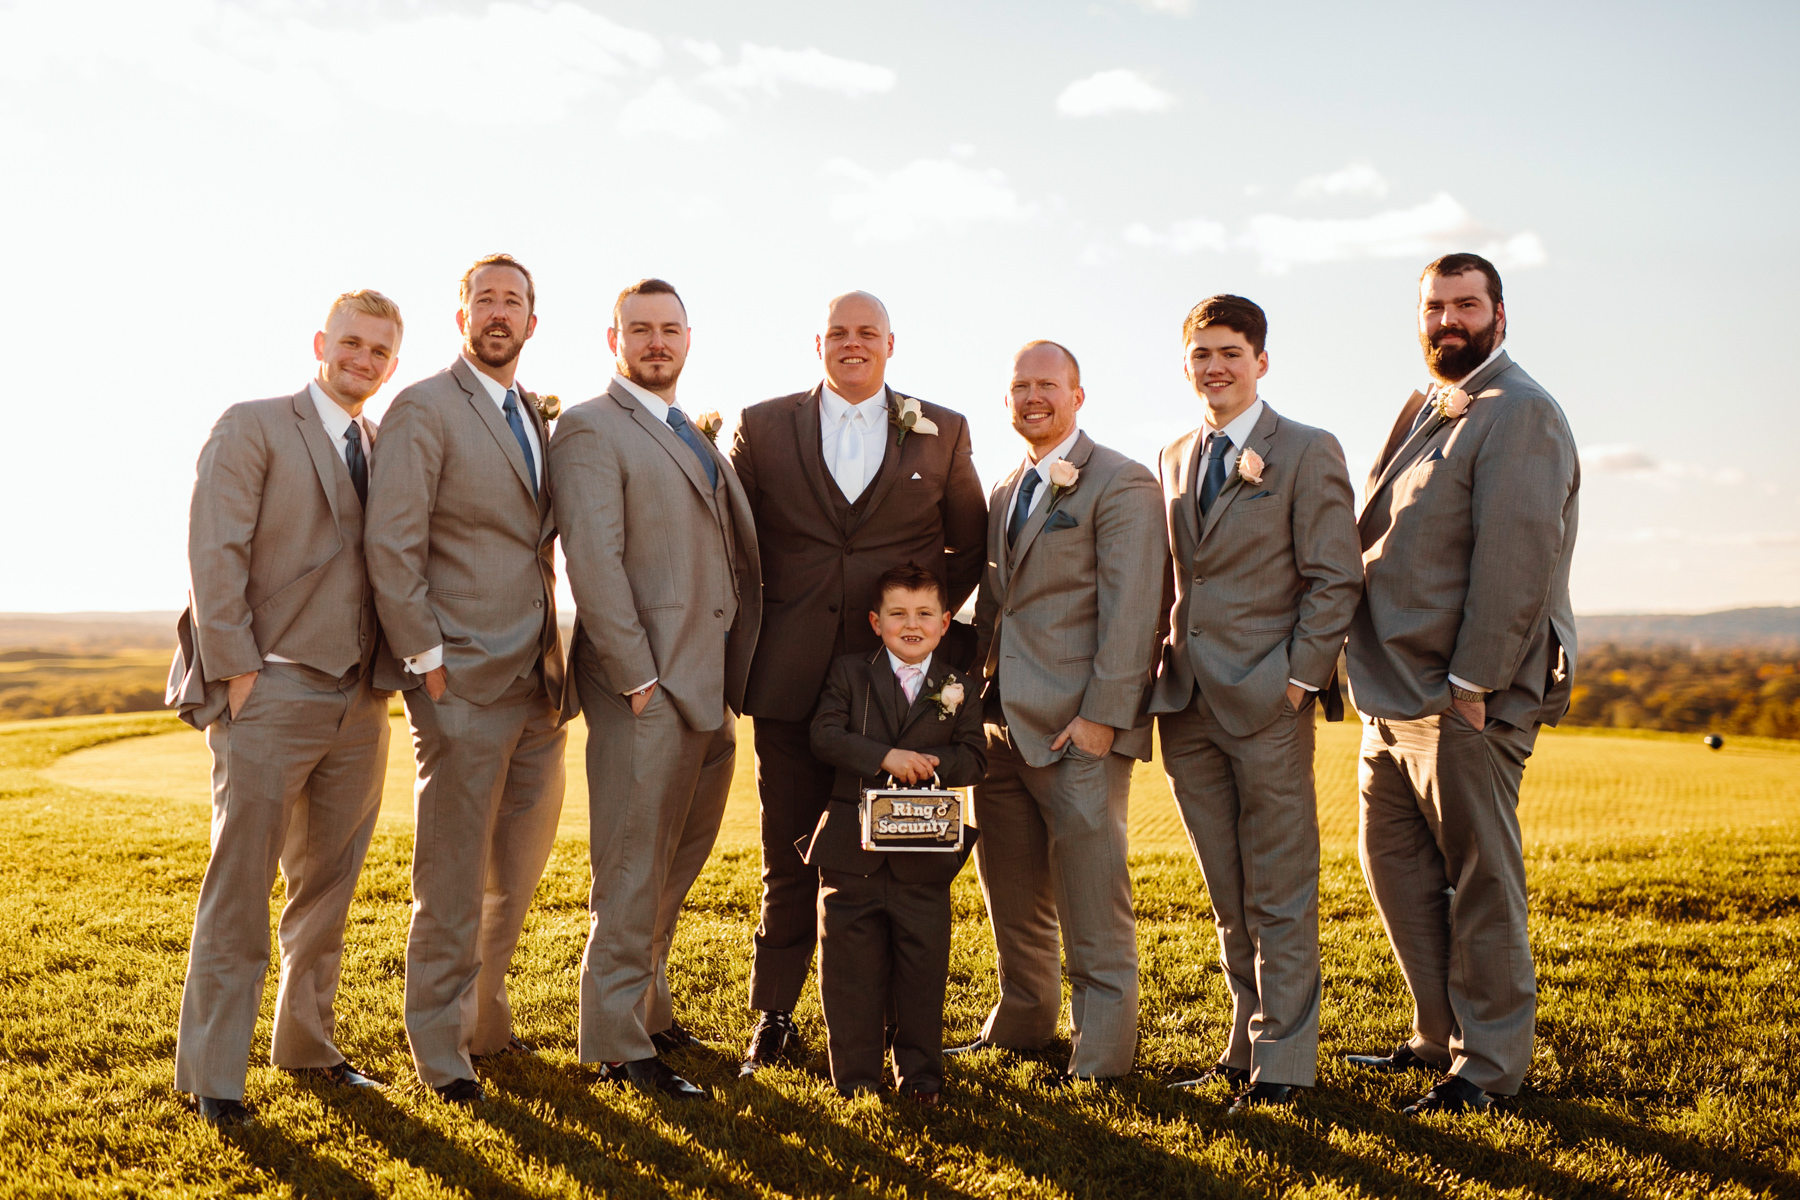 Quincy Ma Massachusetts Wedding Dedham Boston Granie Links Wedding New England Catholic Cathedral Liz Osban Photography 63.jpg